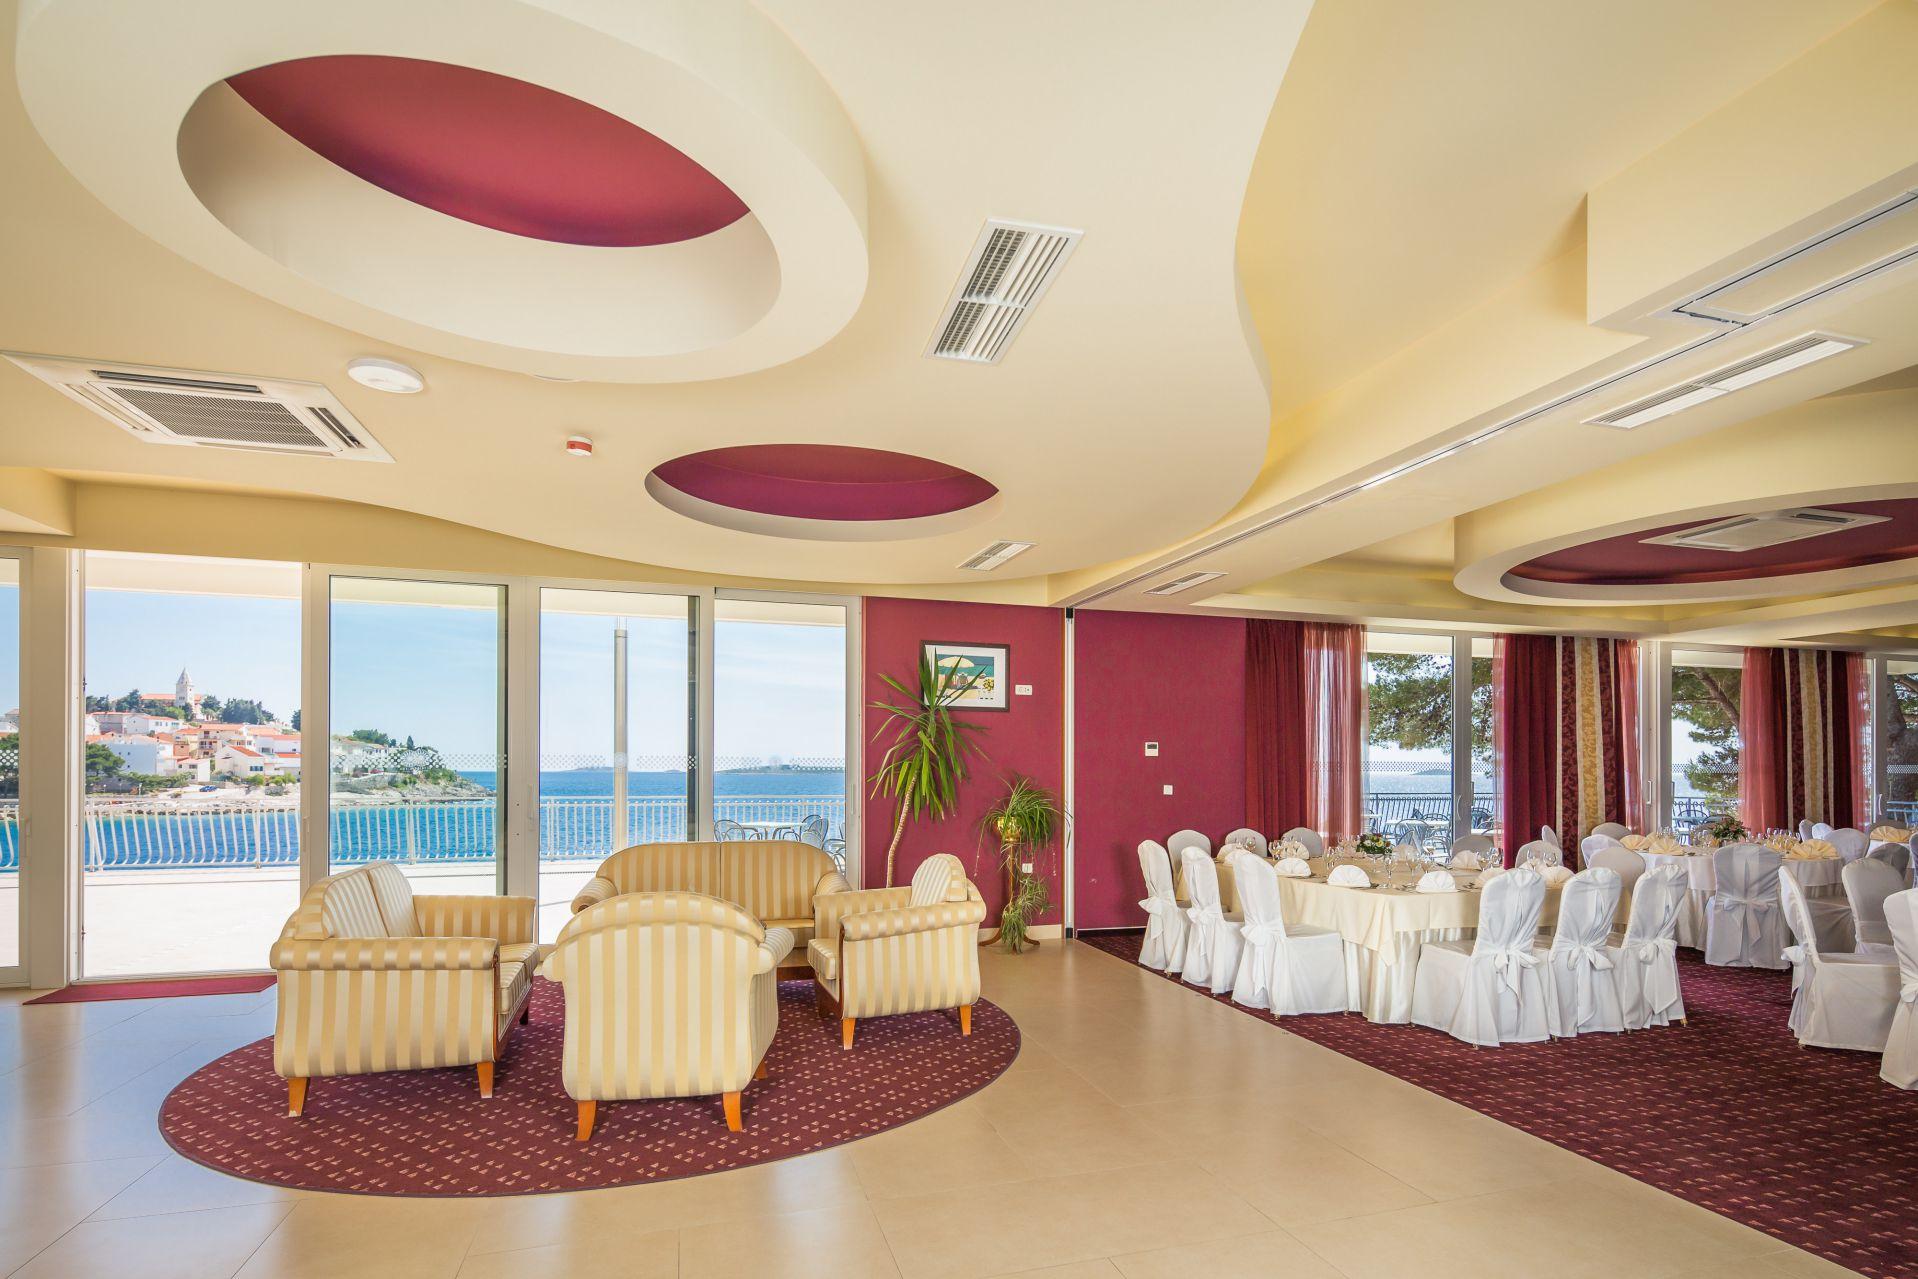 wedding congress center 1 14803319806 o - Zora Hotel